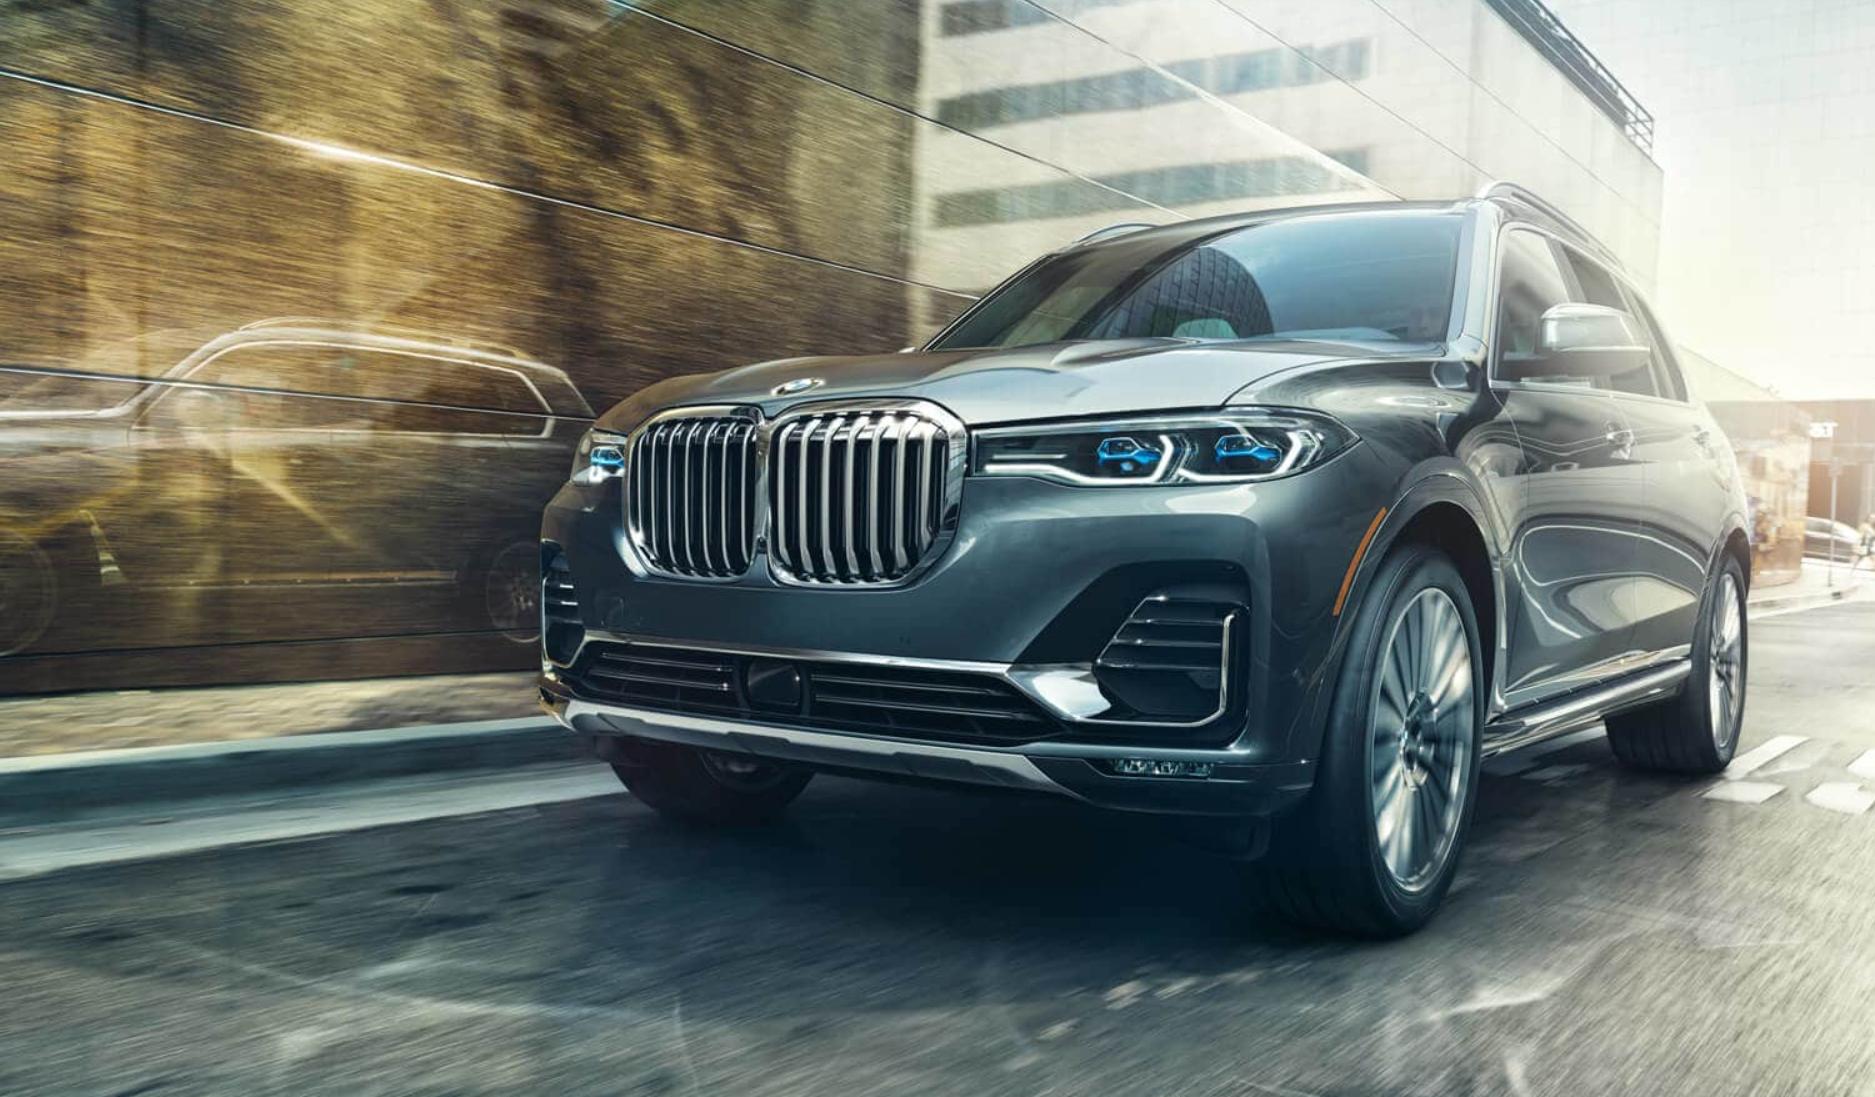 Building a [Big Money] 2019 BMW X7